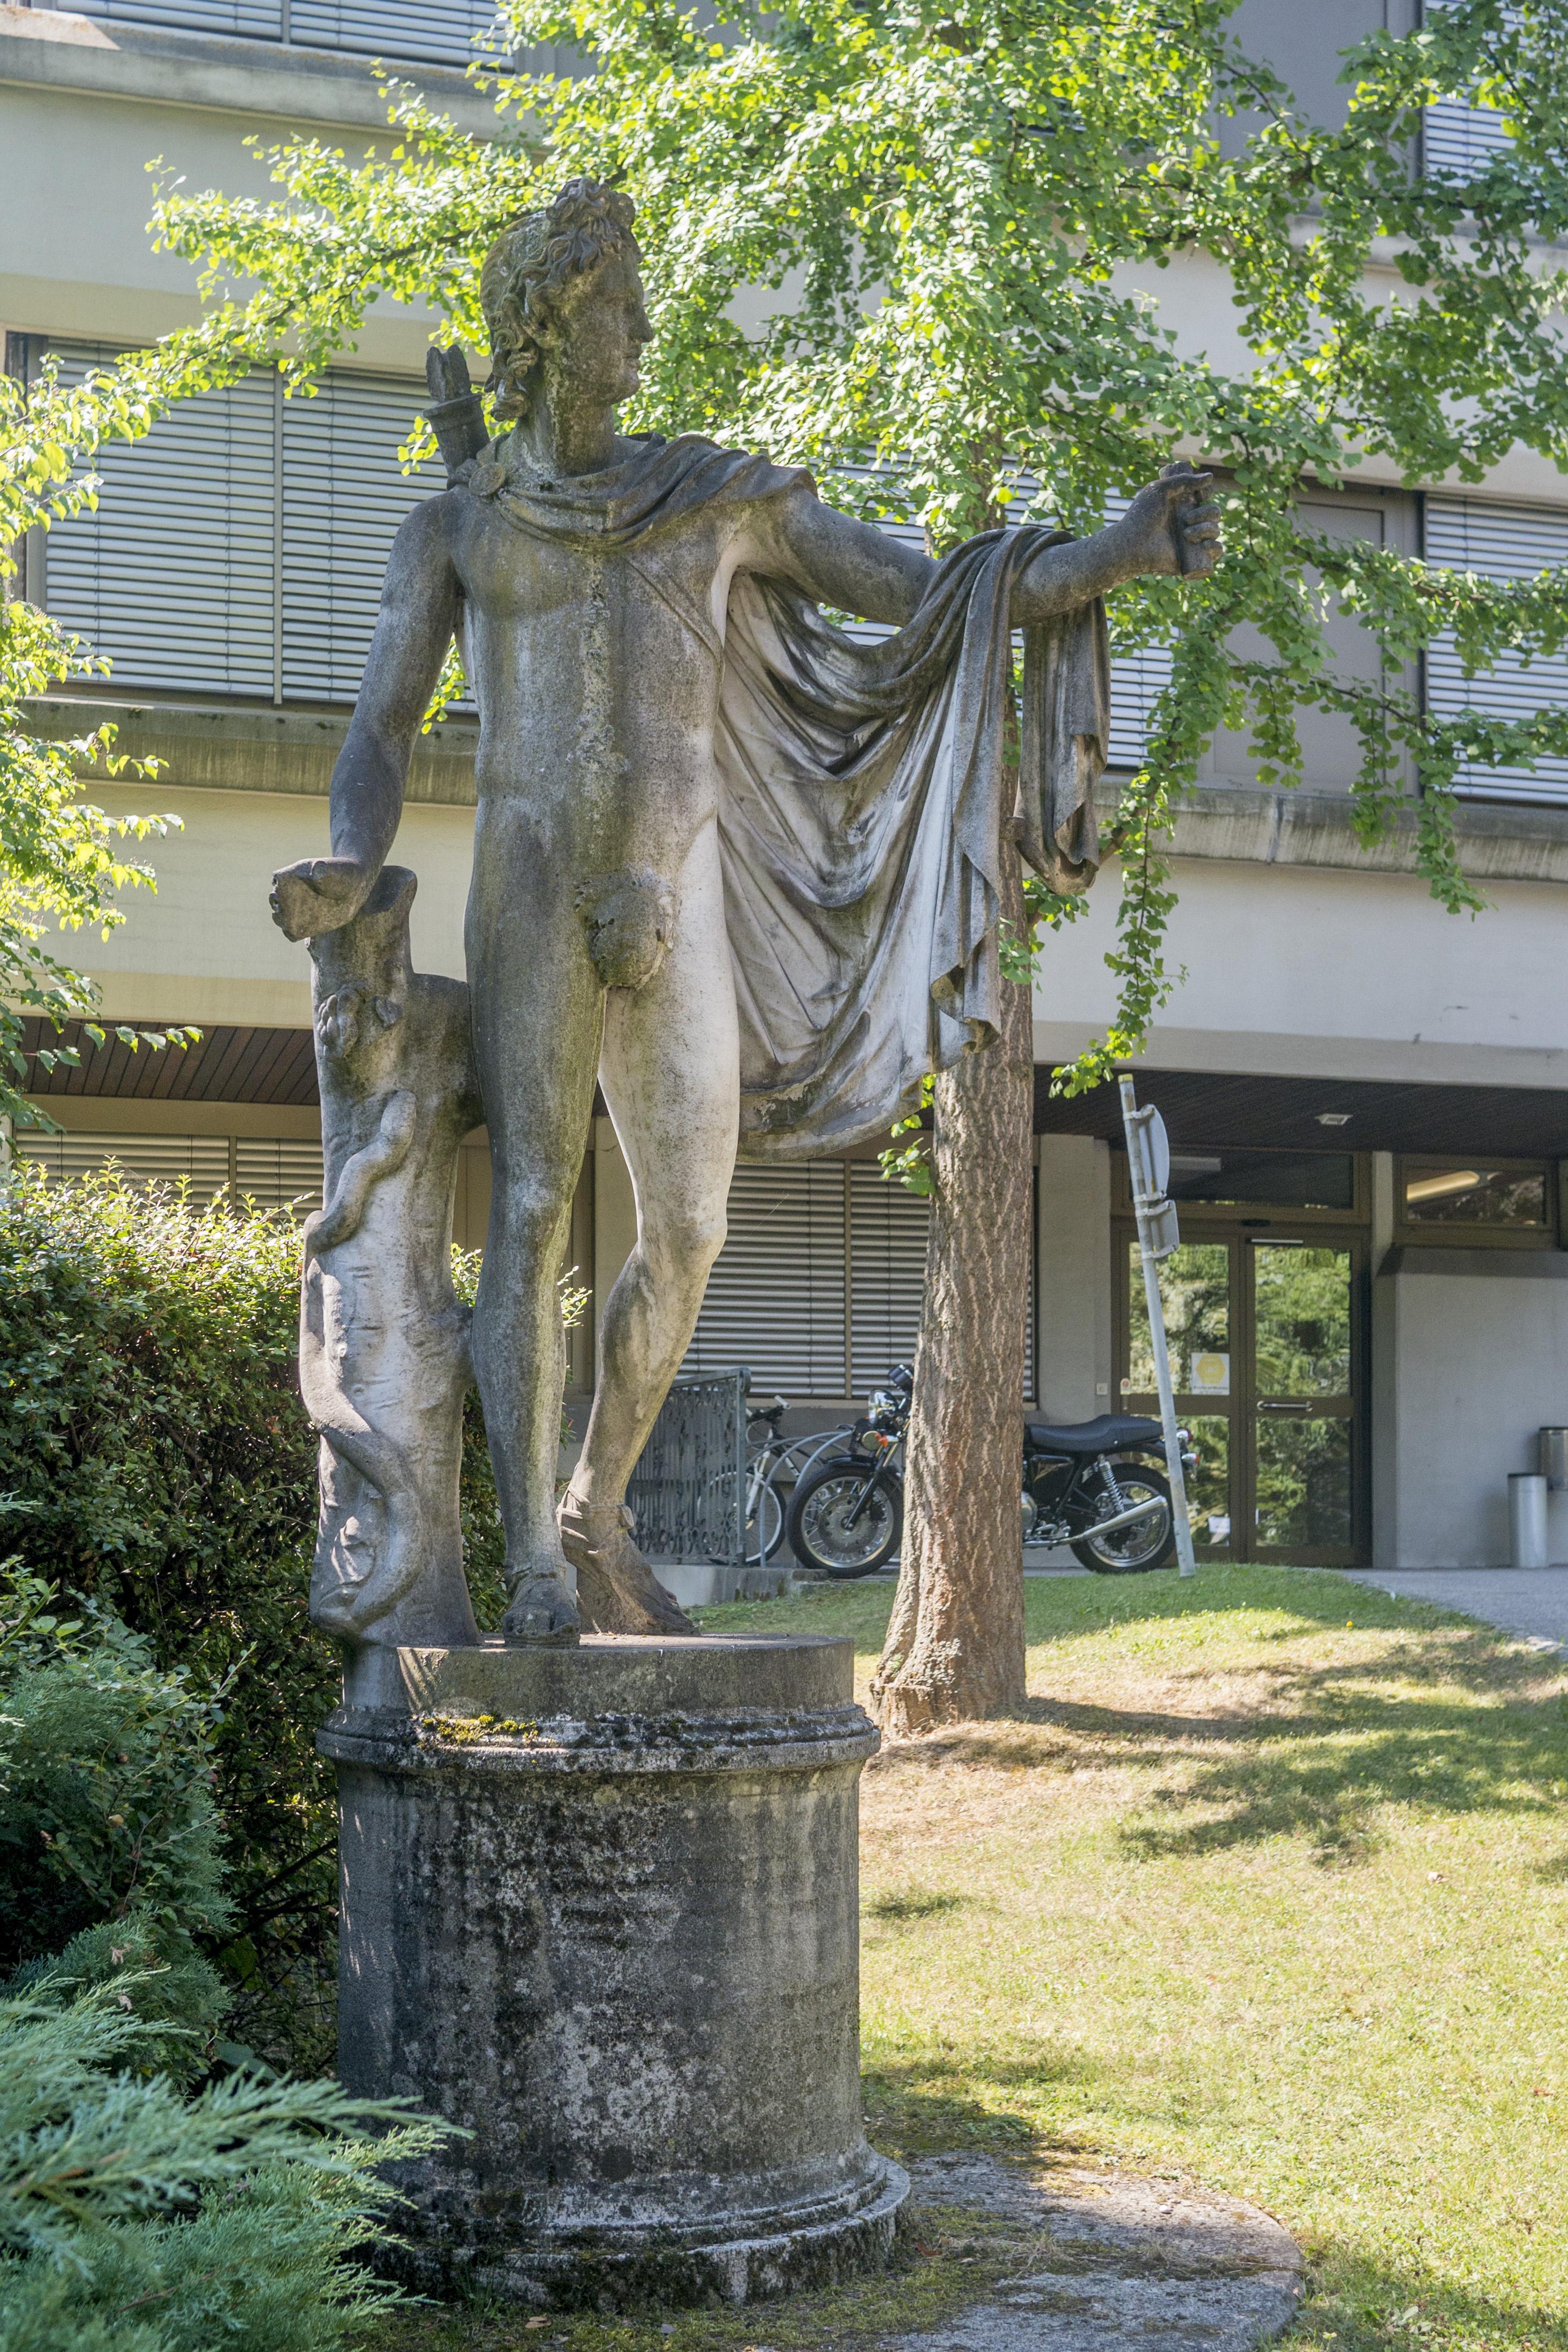 Gartenbau Linz file linz hatschekvilla gartenbaudenkmal 3 jpg wikimedia commons